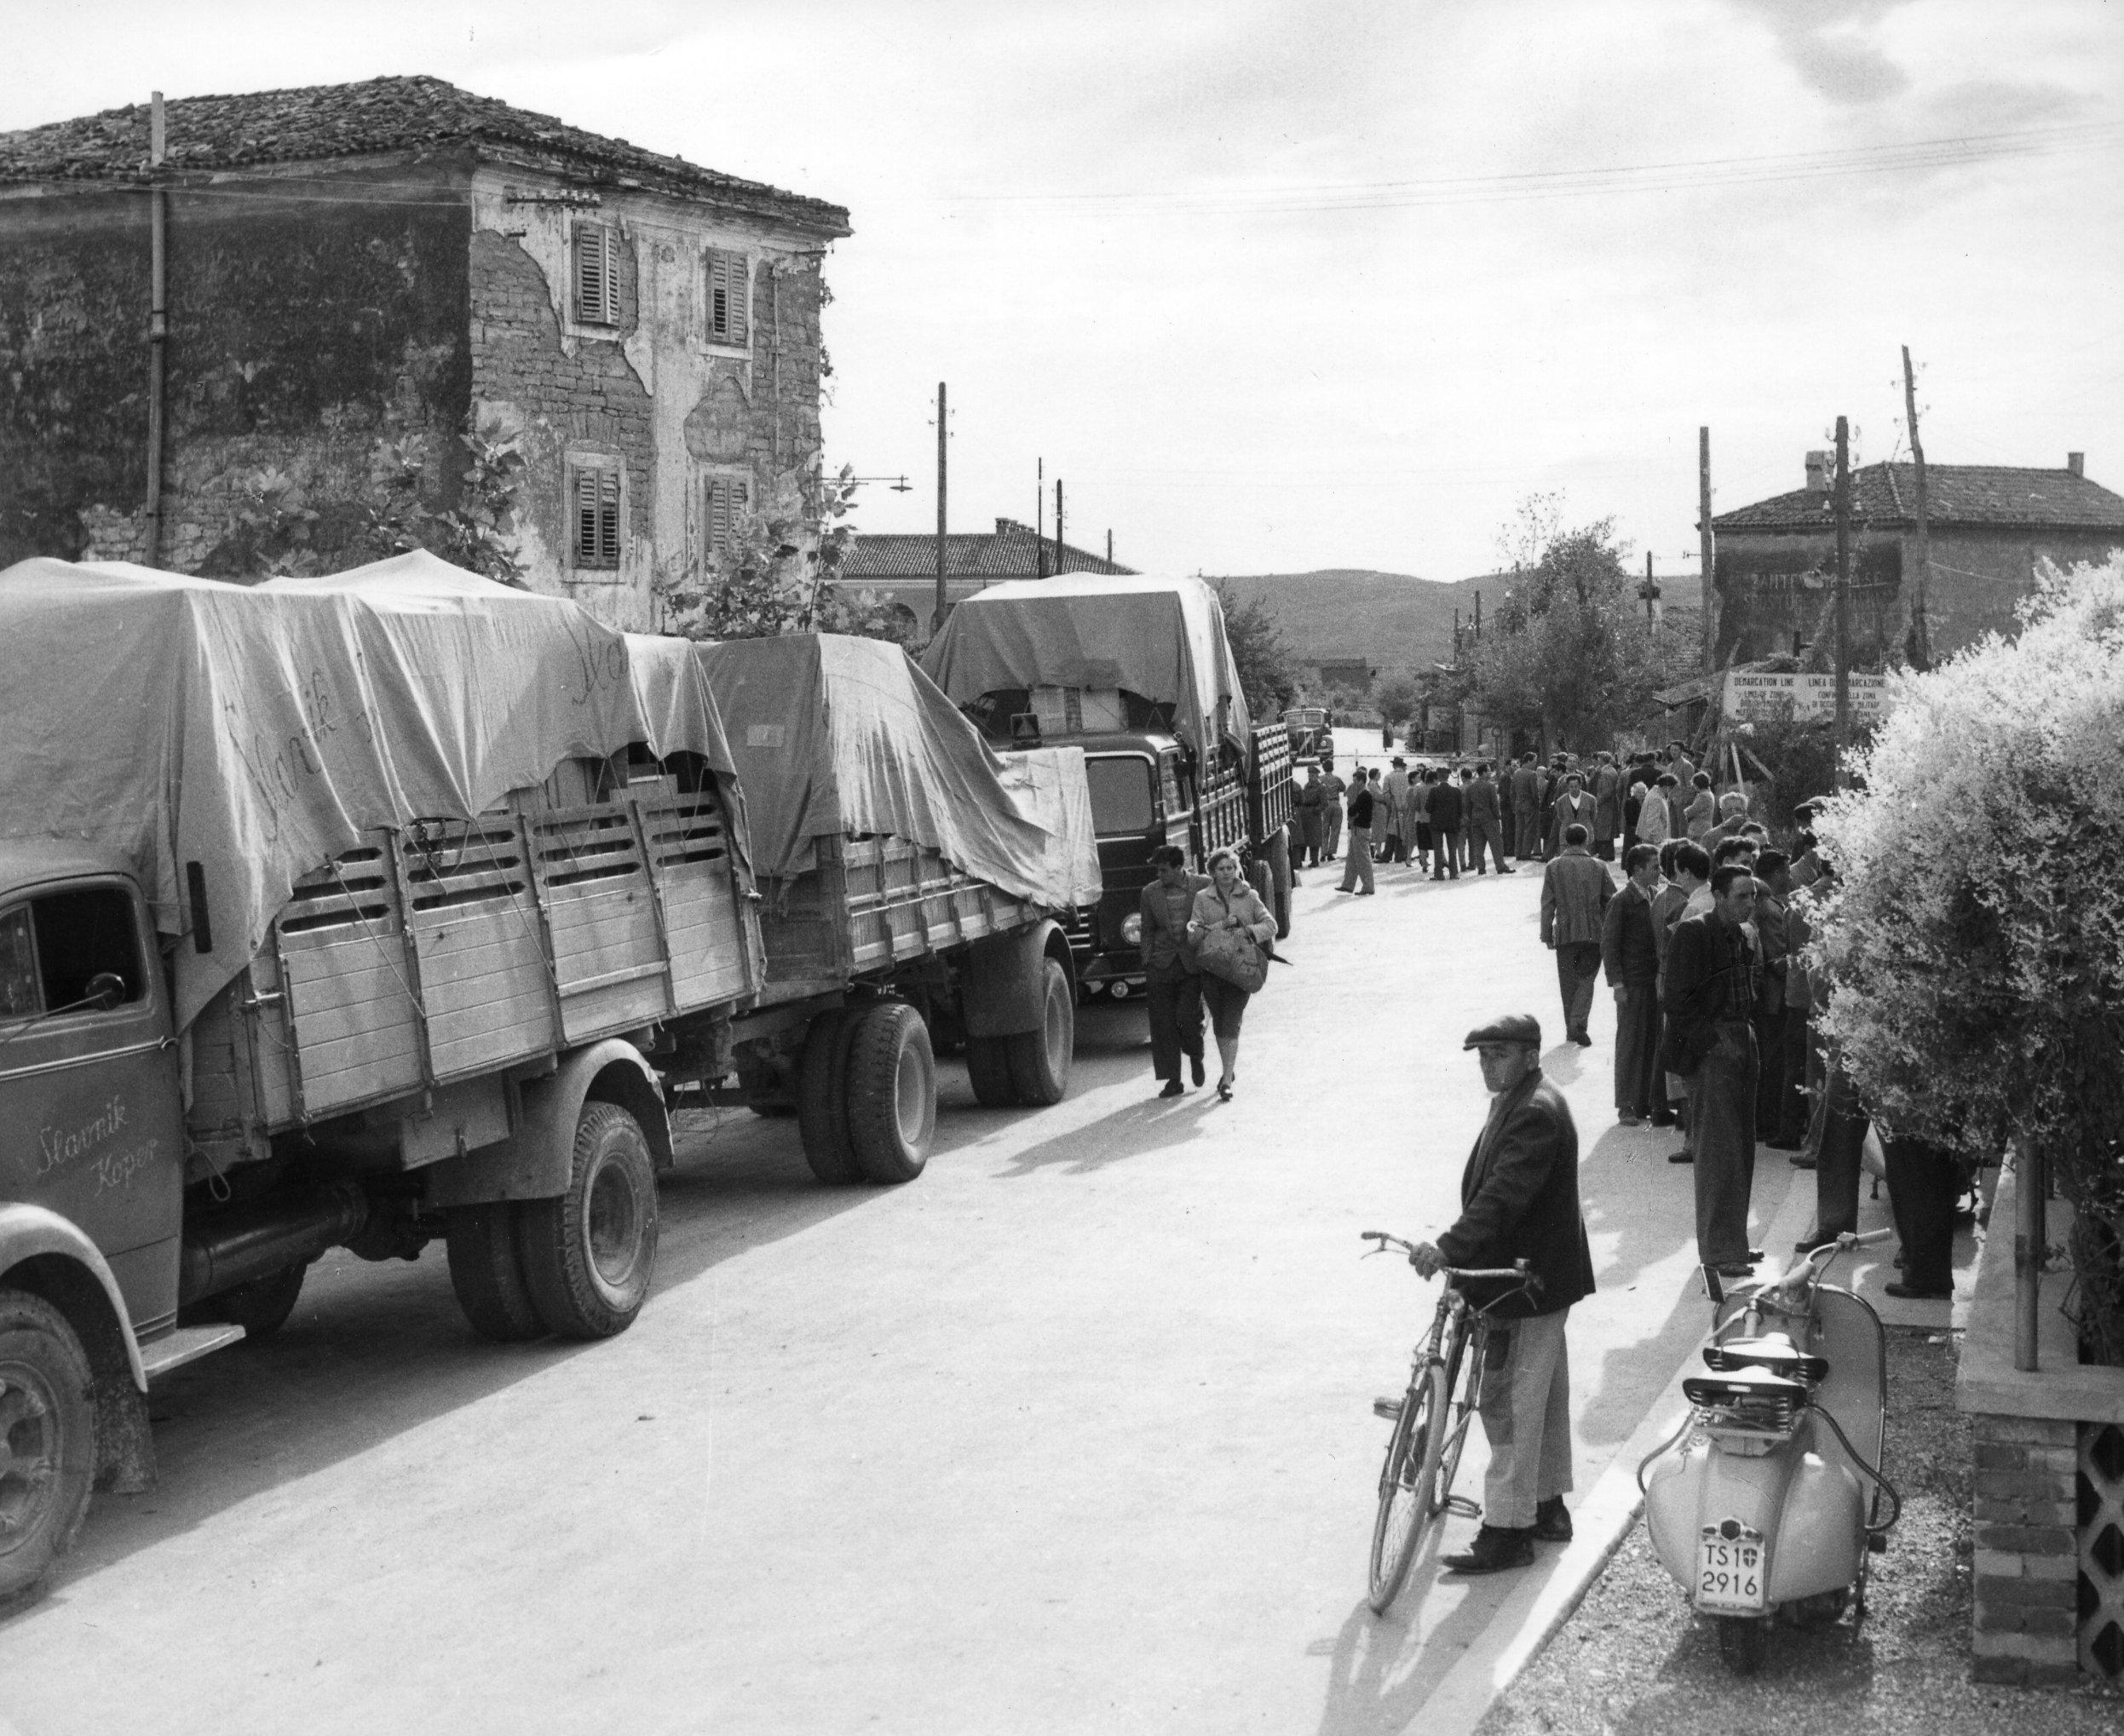 039_IX-22b4 7.10.54 esodo Istria_7_ottobre_1954_Albaro_Vescova